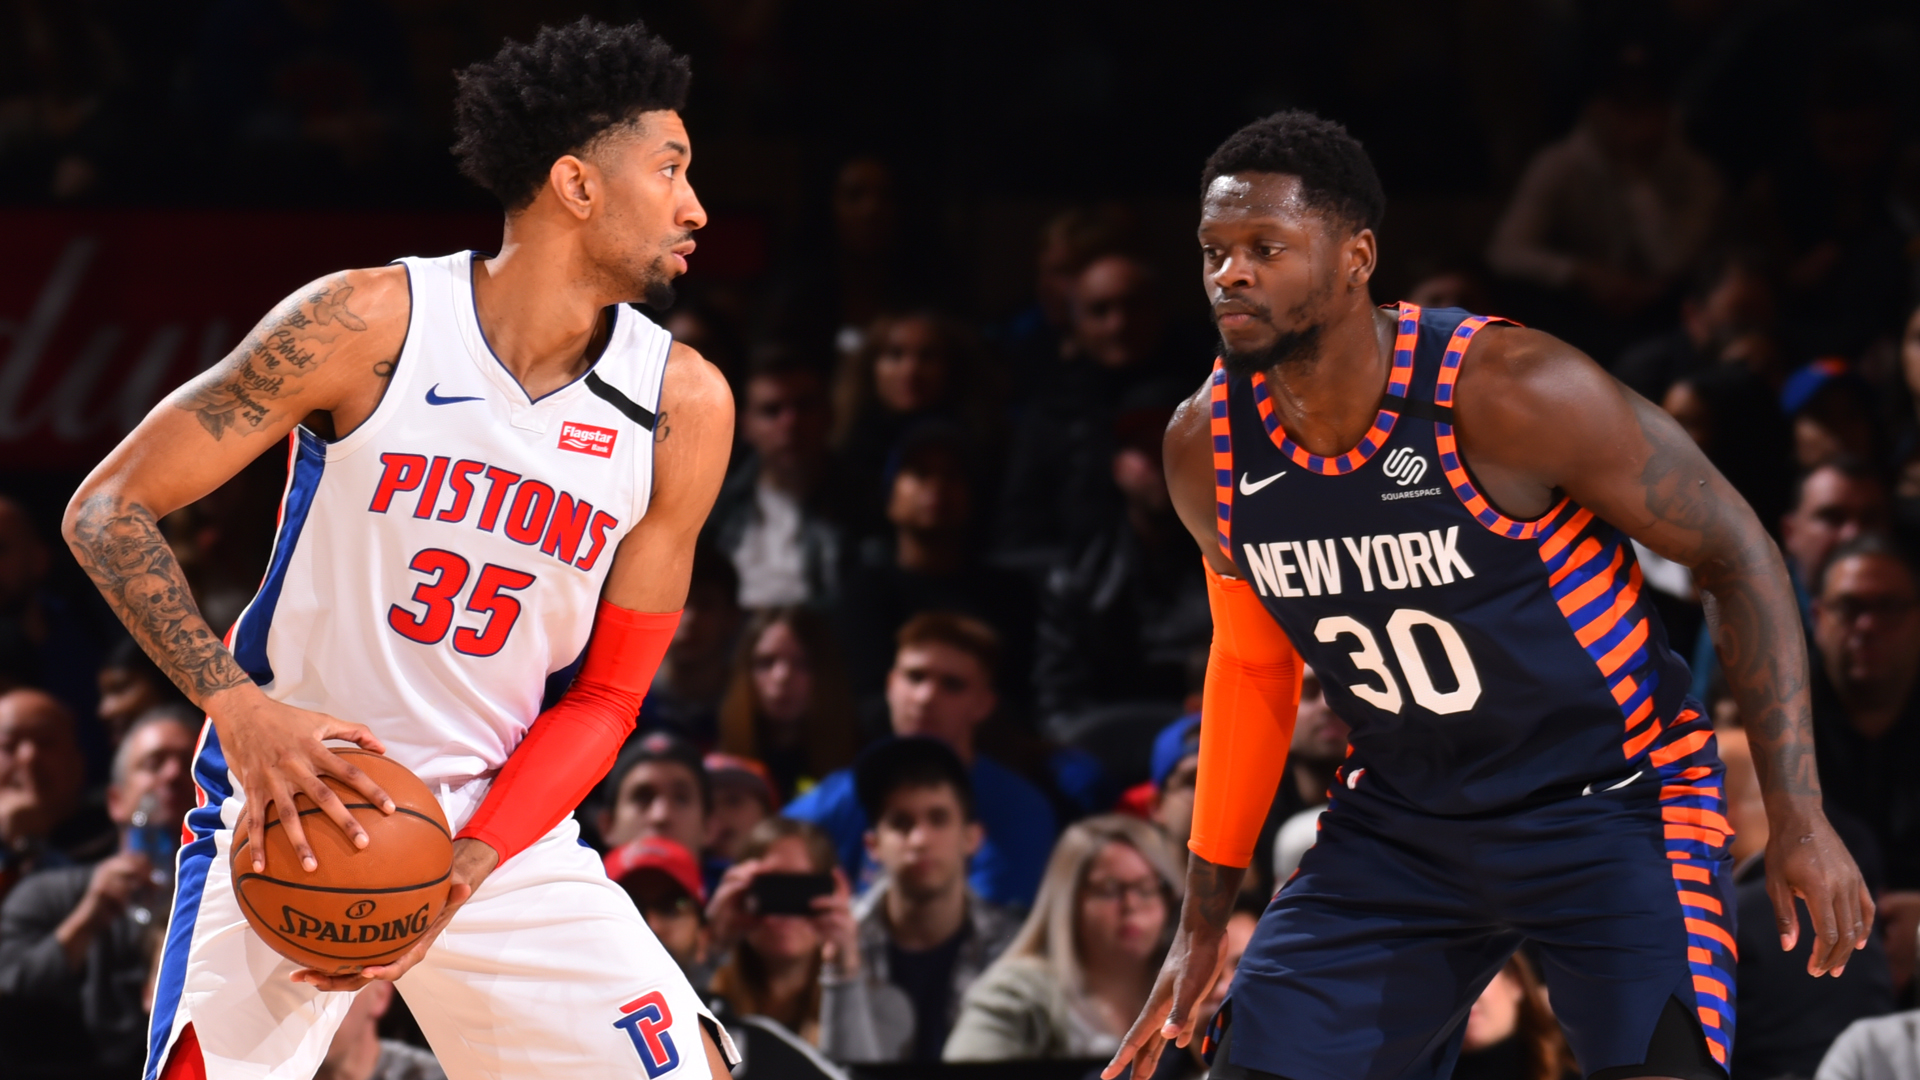 Pistons @ Knicks